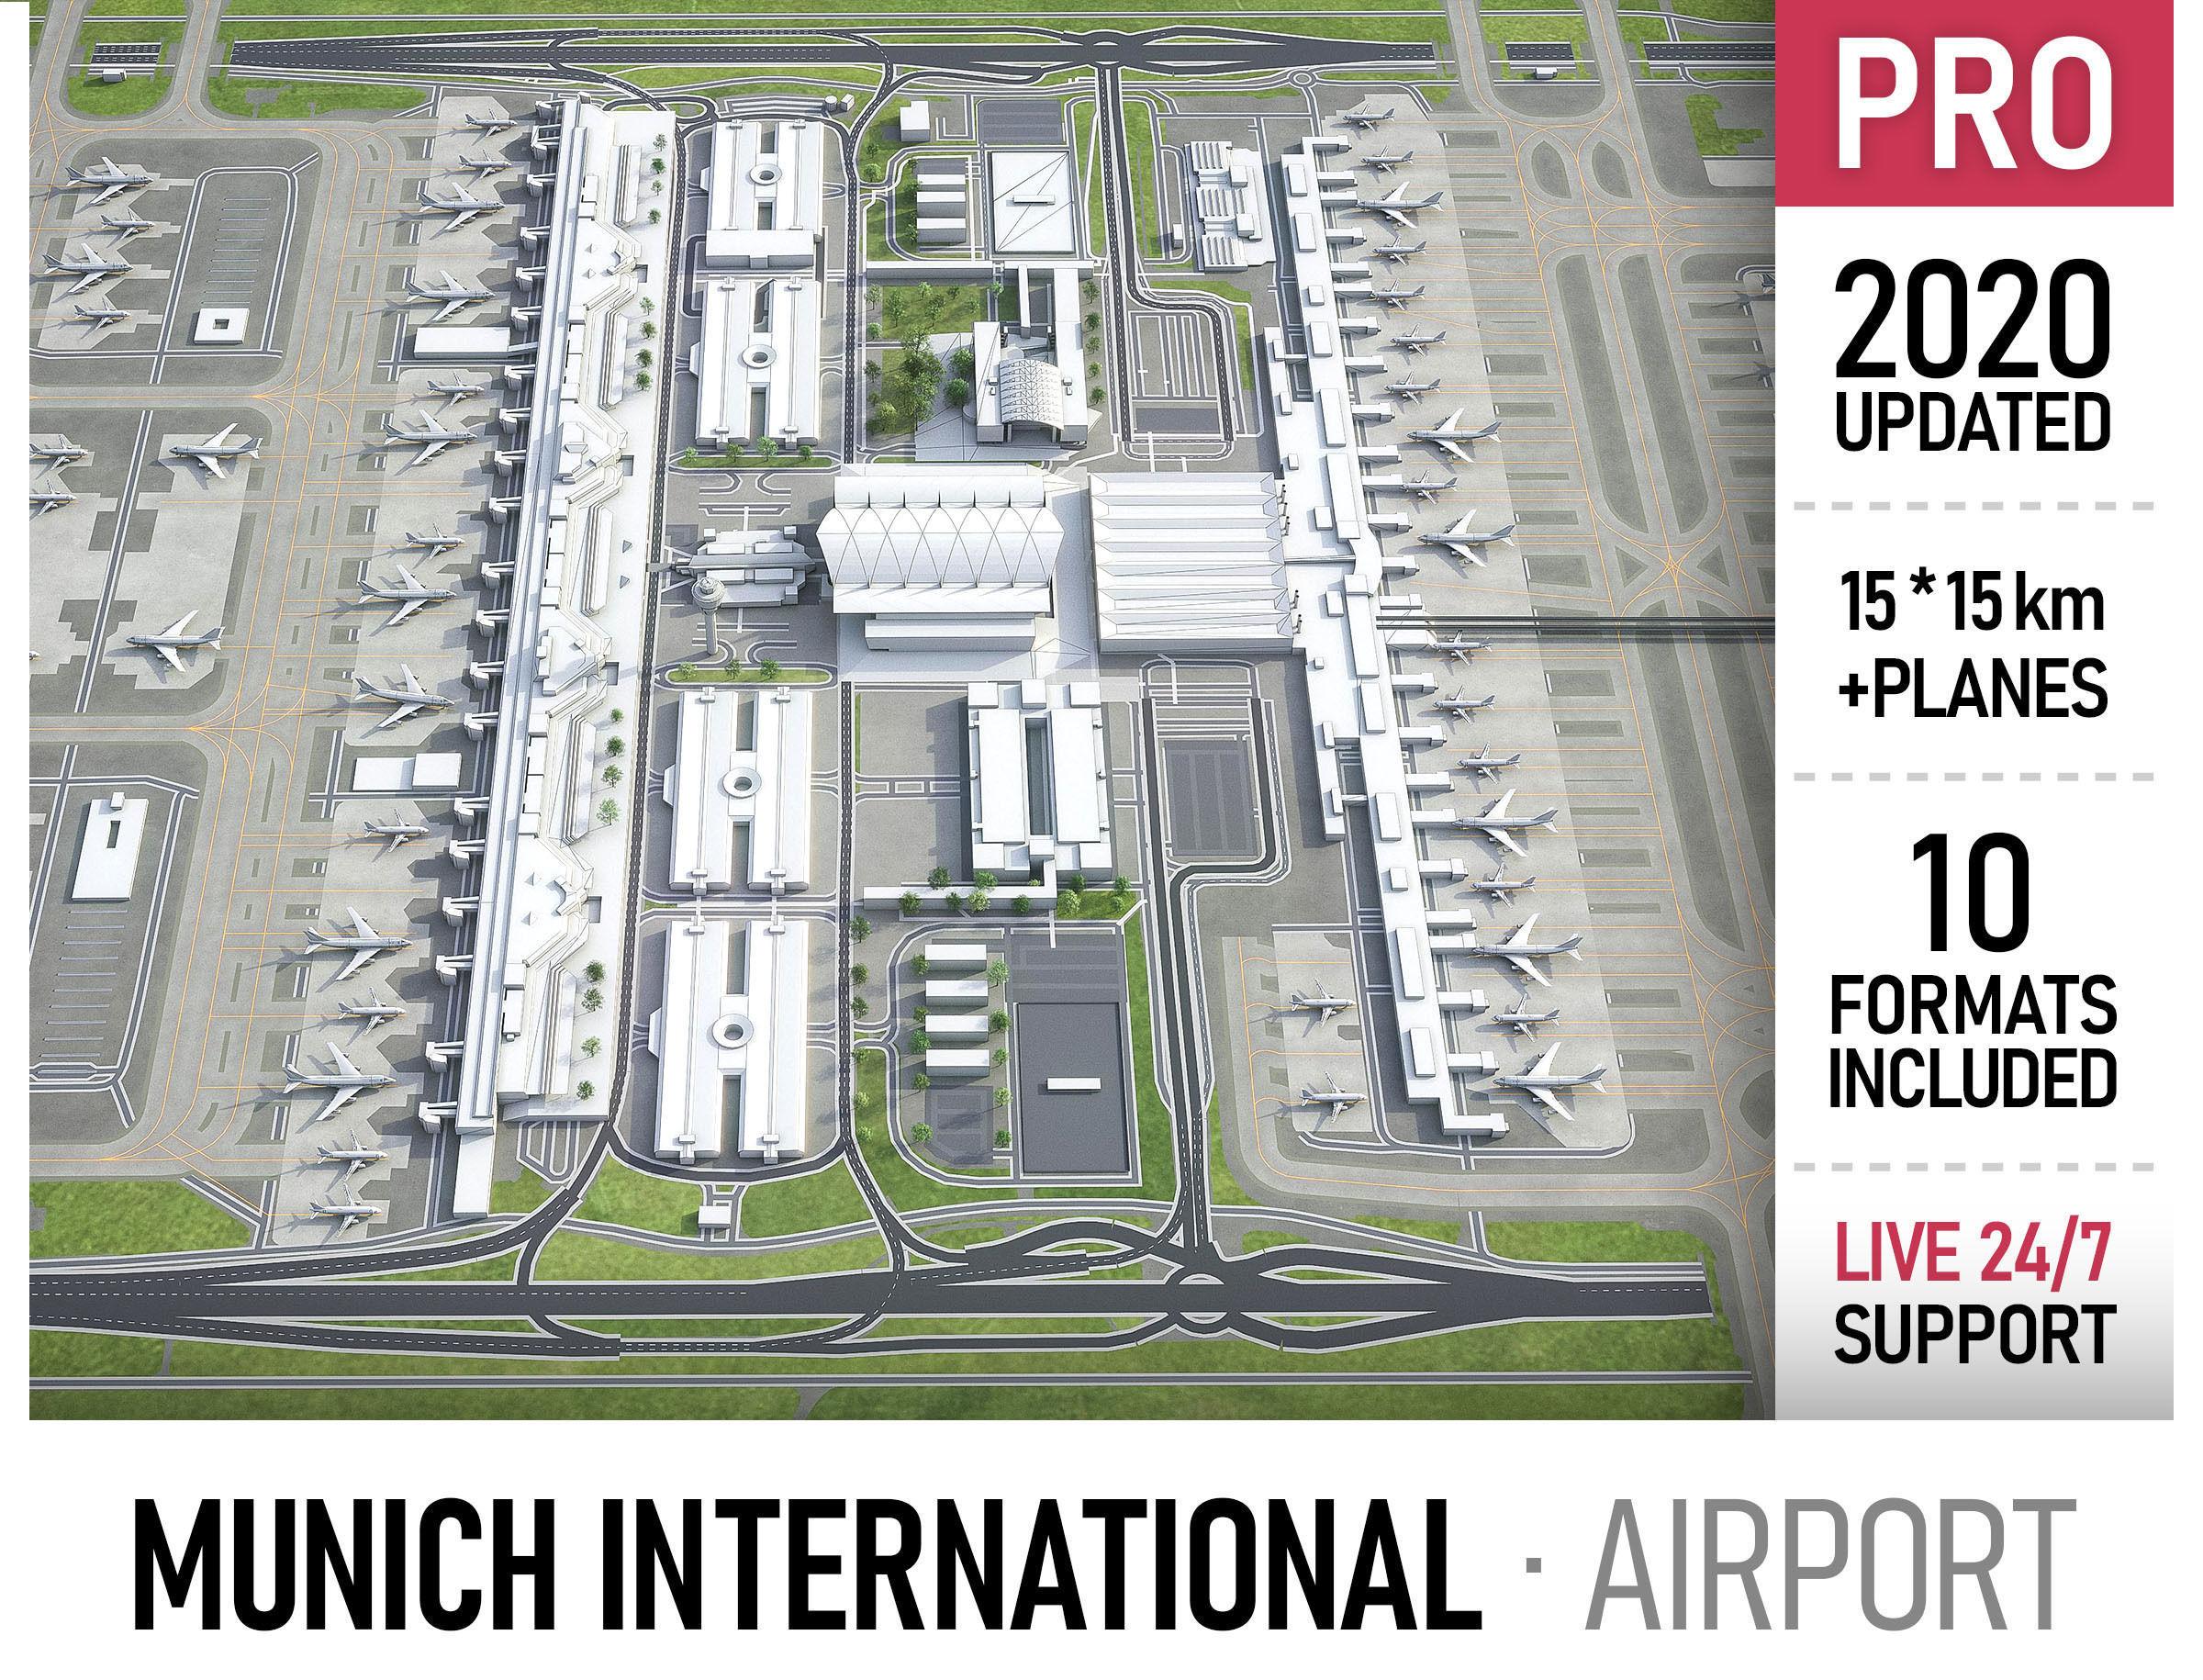 Munich International Airport - MUC